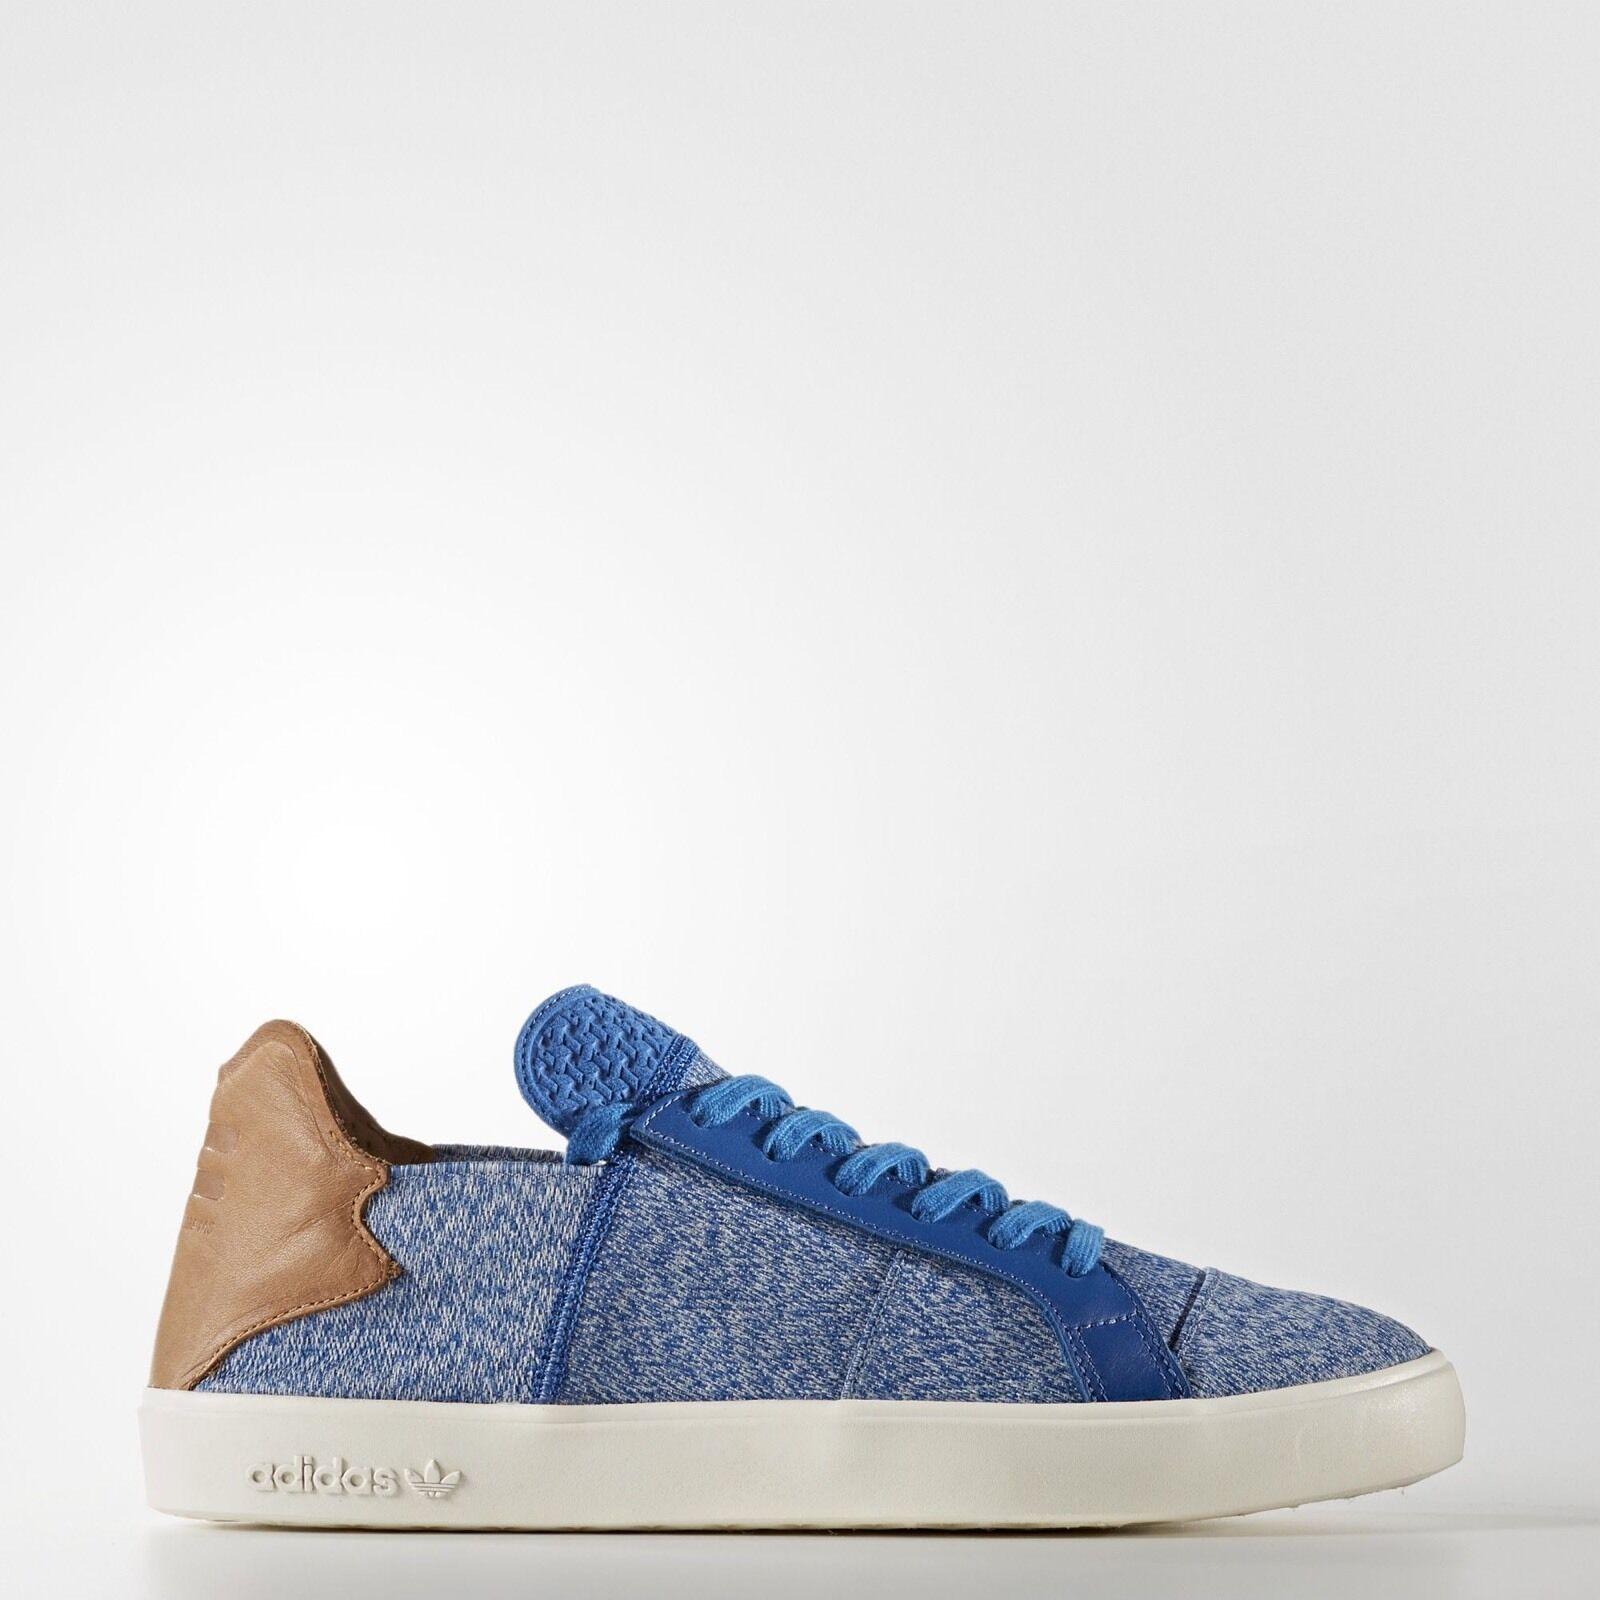 Adidas, te merletto pw pharrell williams aq5779 dimensioni 11,5 blu limited | Lo stile più nuovo  | Sig/Sig Ra Scarpa